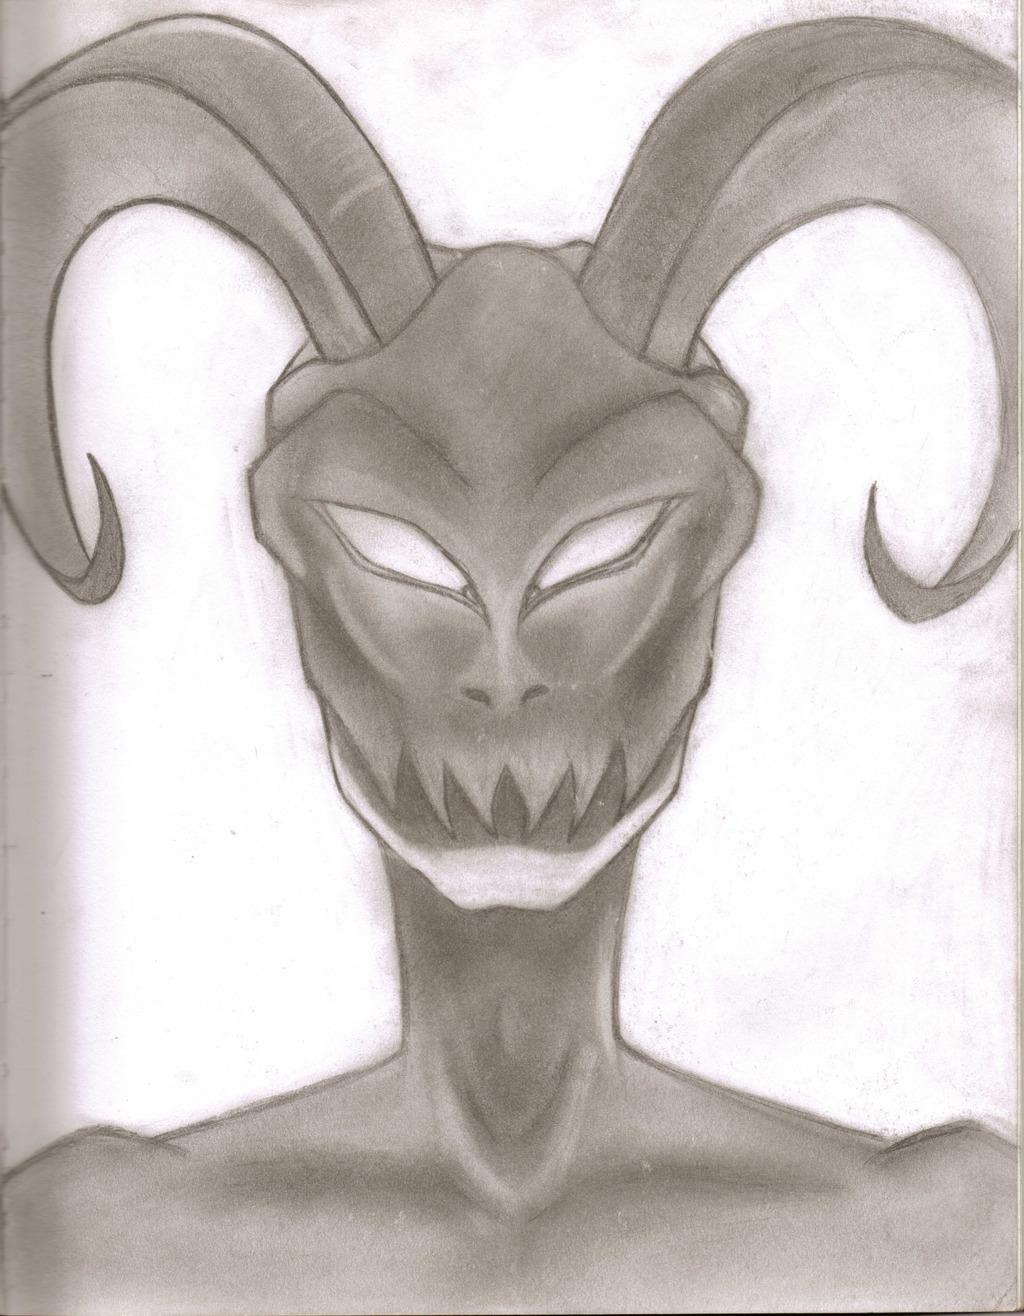 Most recent image: The Gargoyle of Baronajk